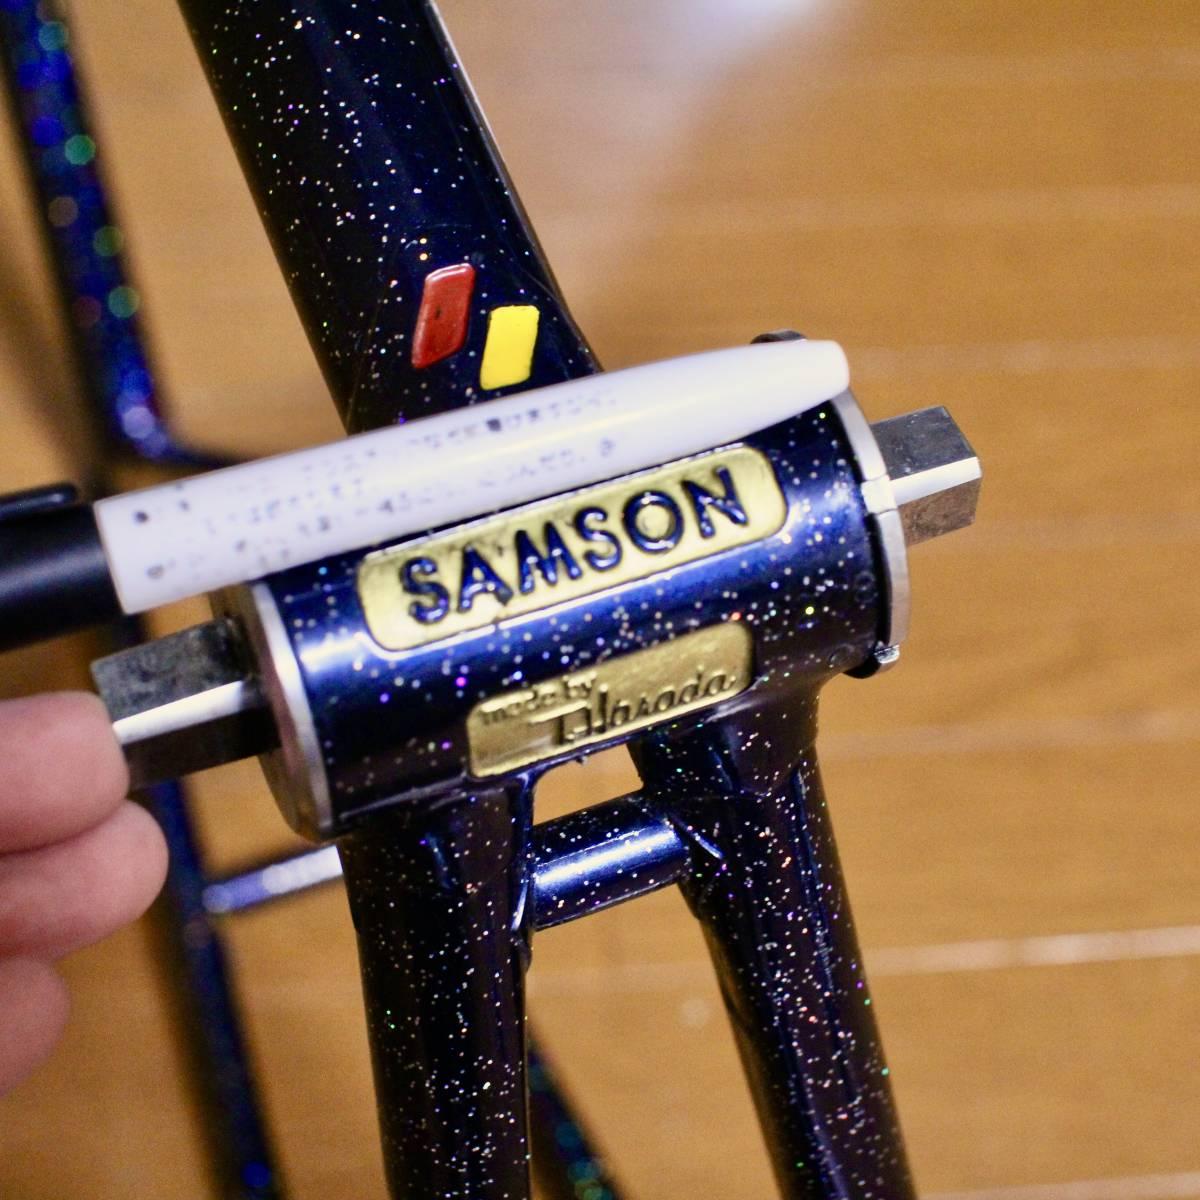 COLUMBUS コロンバス SAMSON サムソン 金縁ロゴ レインボーラメフレーク 競輪フレーム 525mm レイノルズ ピスト NJS 下地メッキ_画像10